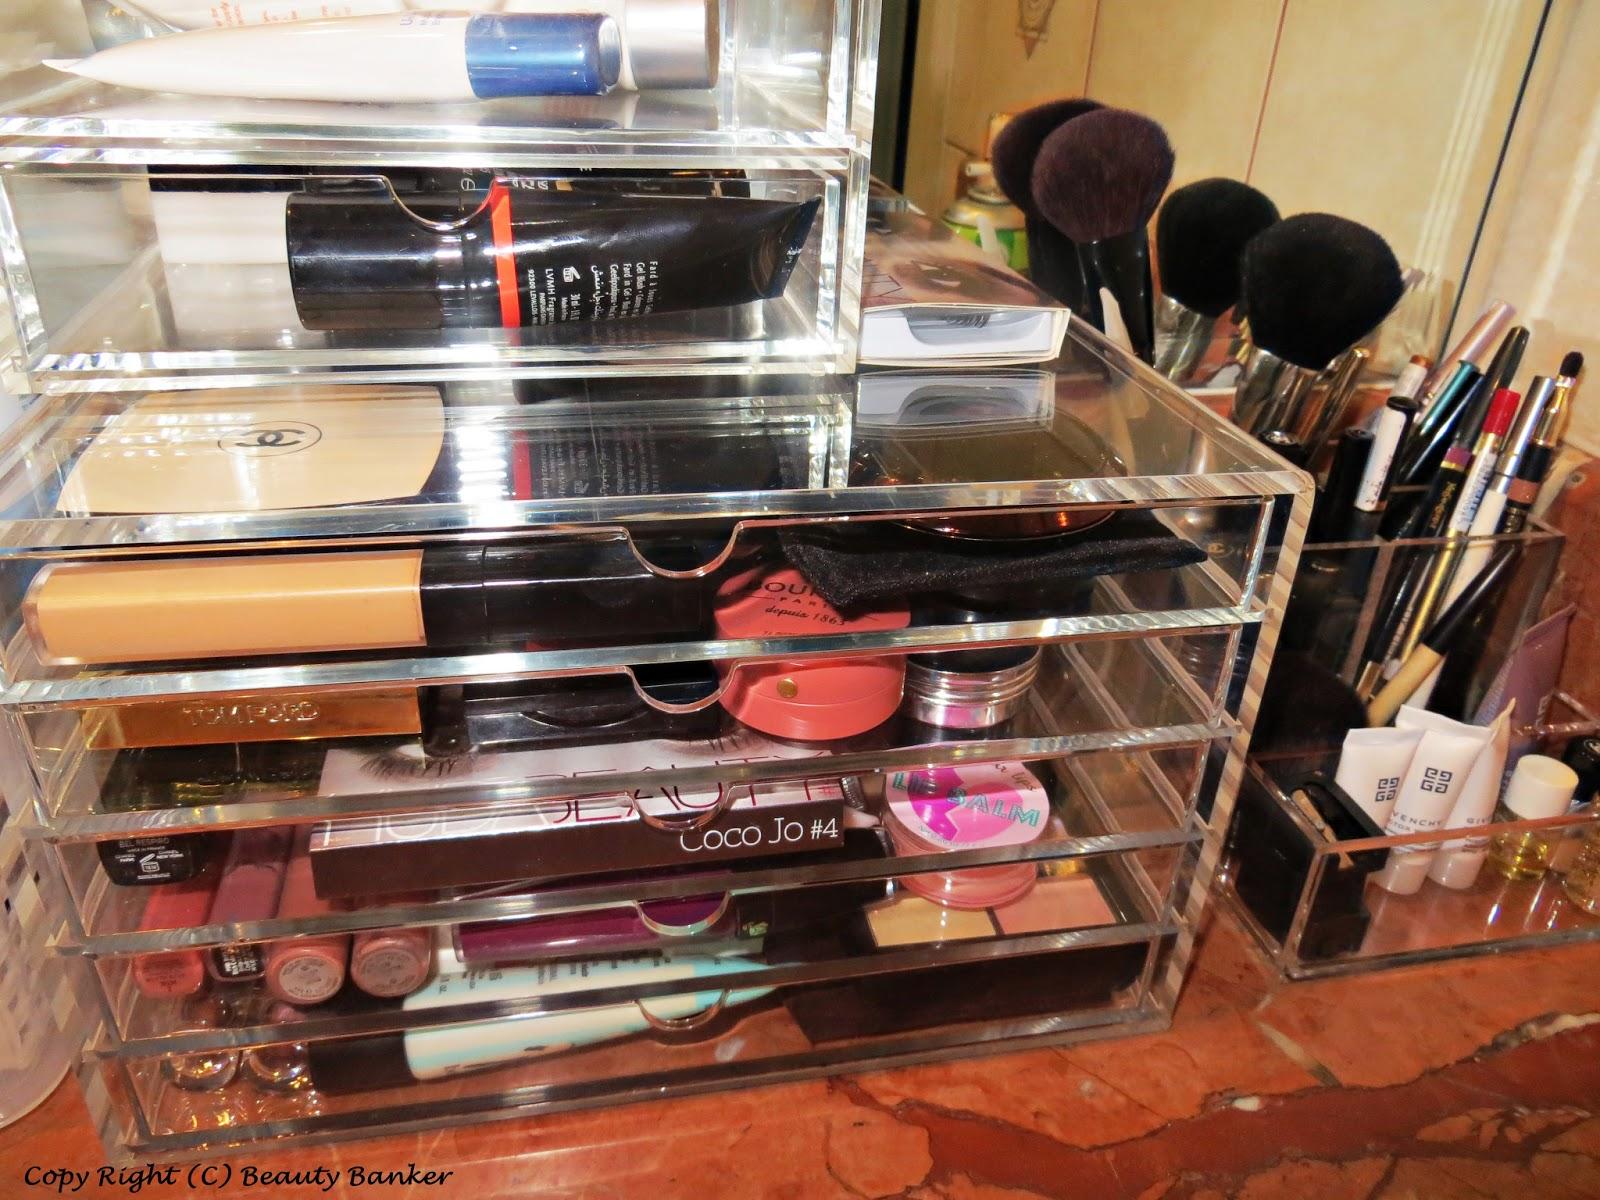 My New Makeup Storage Muji Clear Acrylic Drawers A Bit Of & Acrylic Makeup Drawers Muji - Best Drawer Model